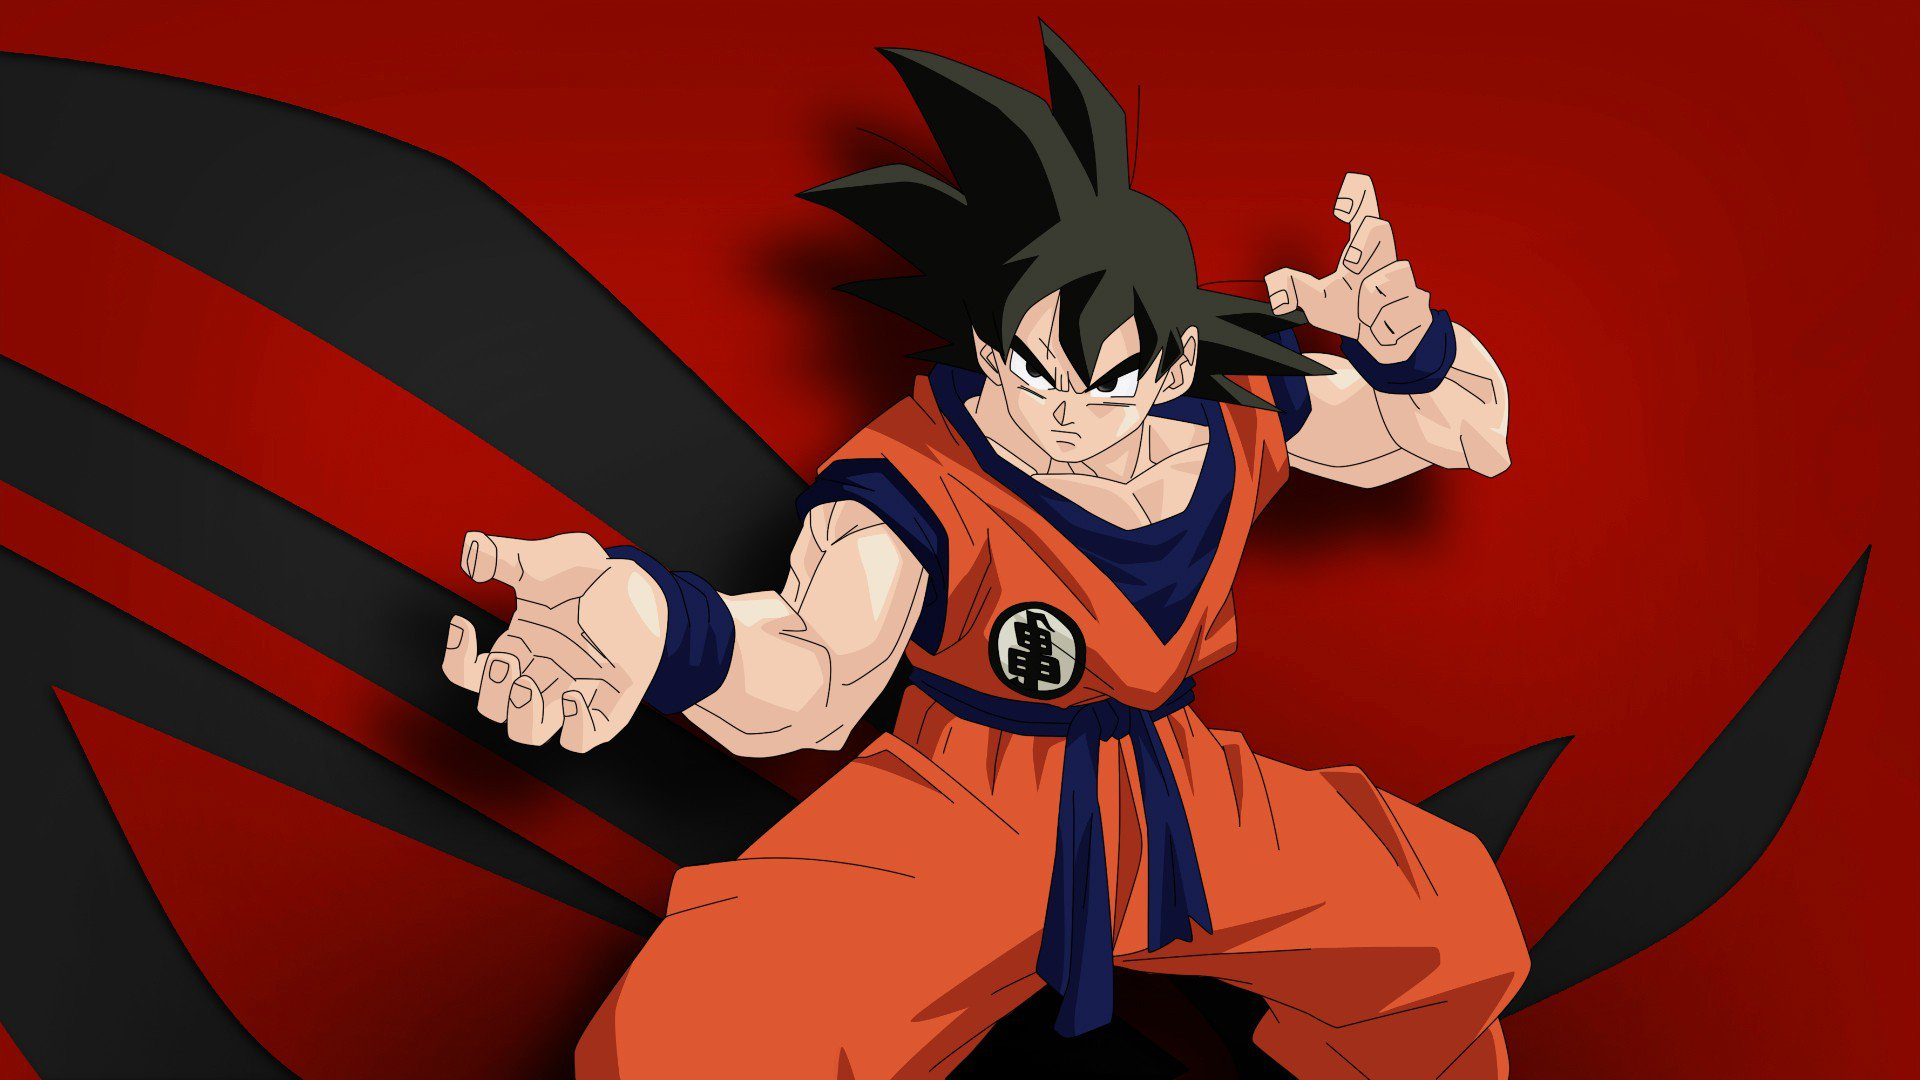 Goku Rog, HD Games, 4k Wallpapers, Images, Backgrounds